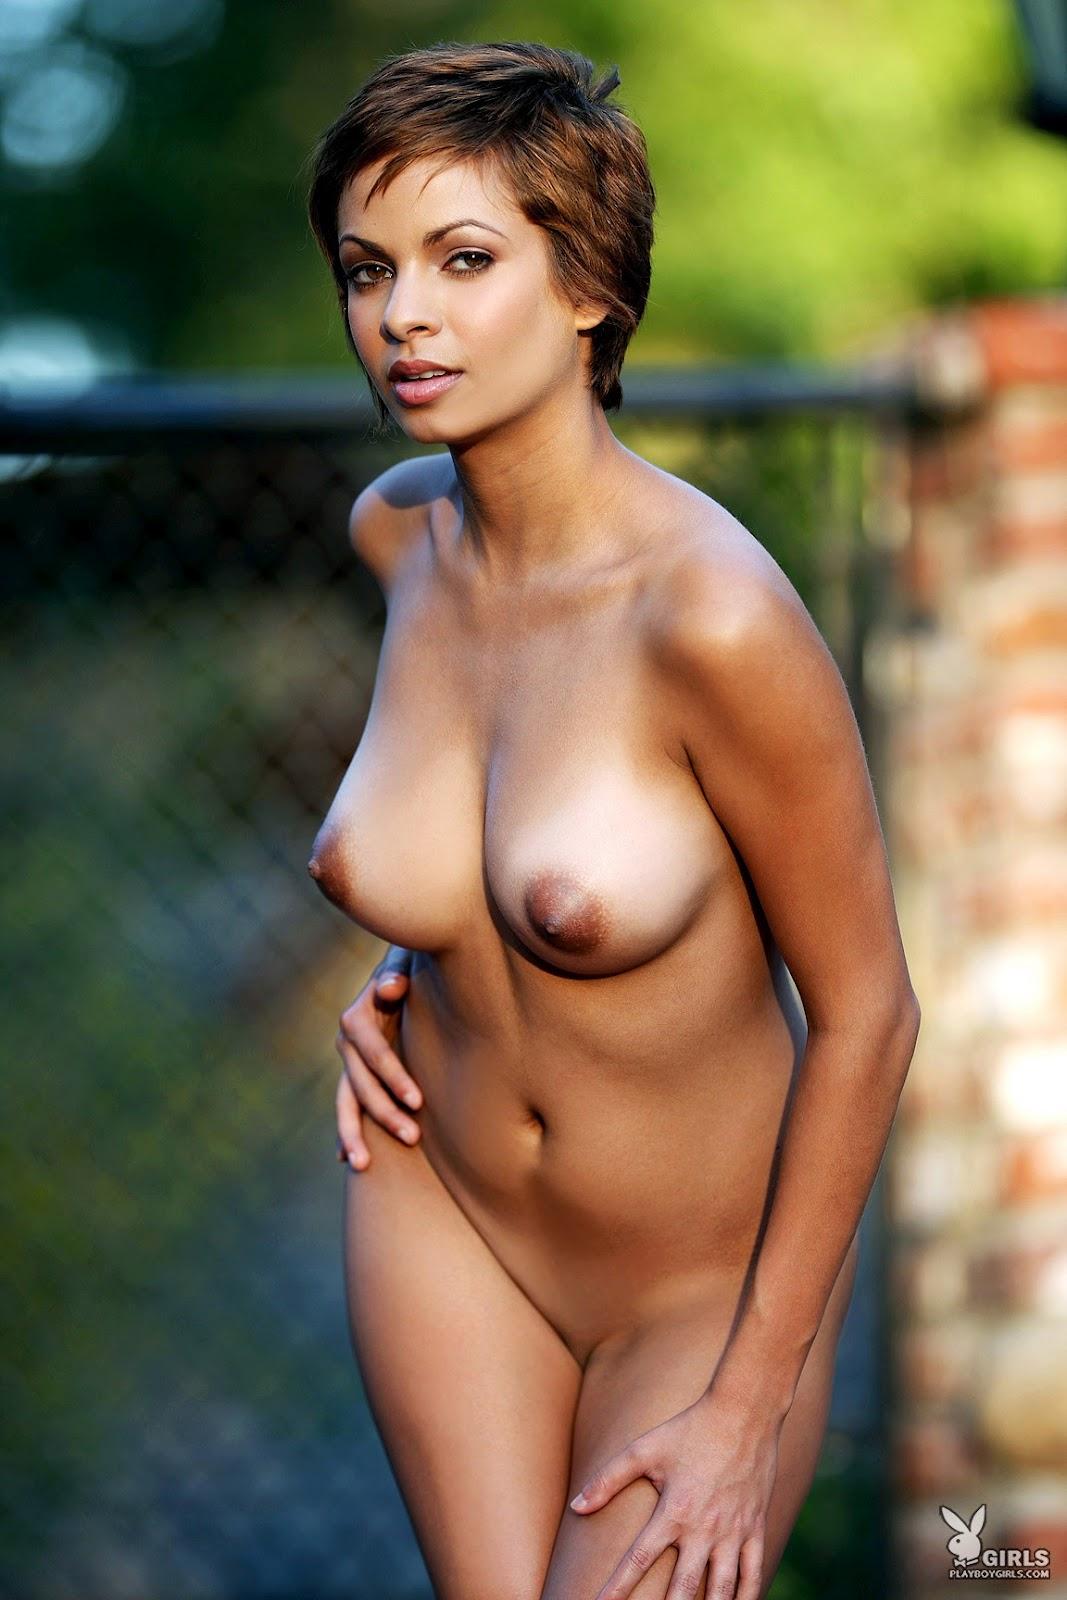 aisha tyler playboy nudes